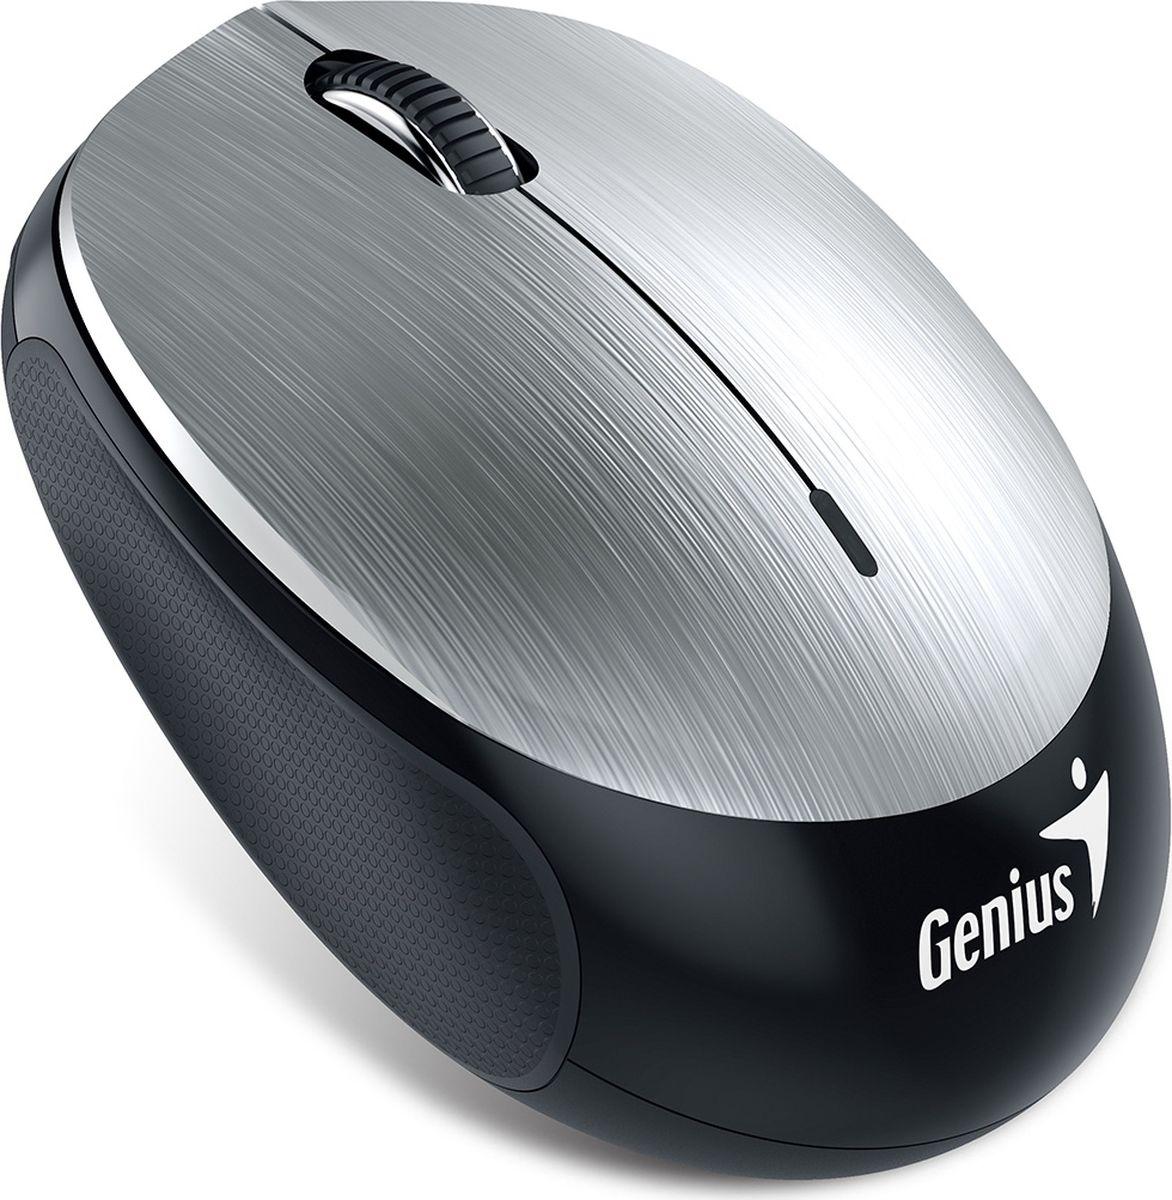 лучшая цена Мышь Genius NX-9000BT V2, Silver беспроводная